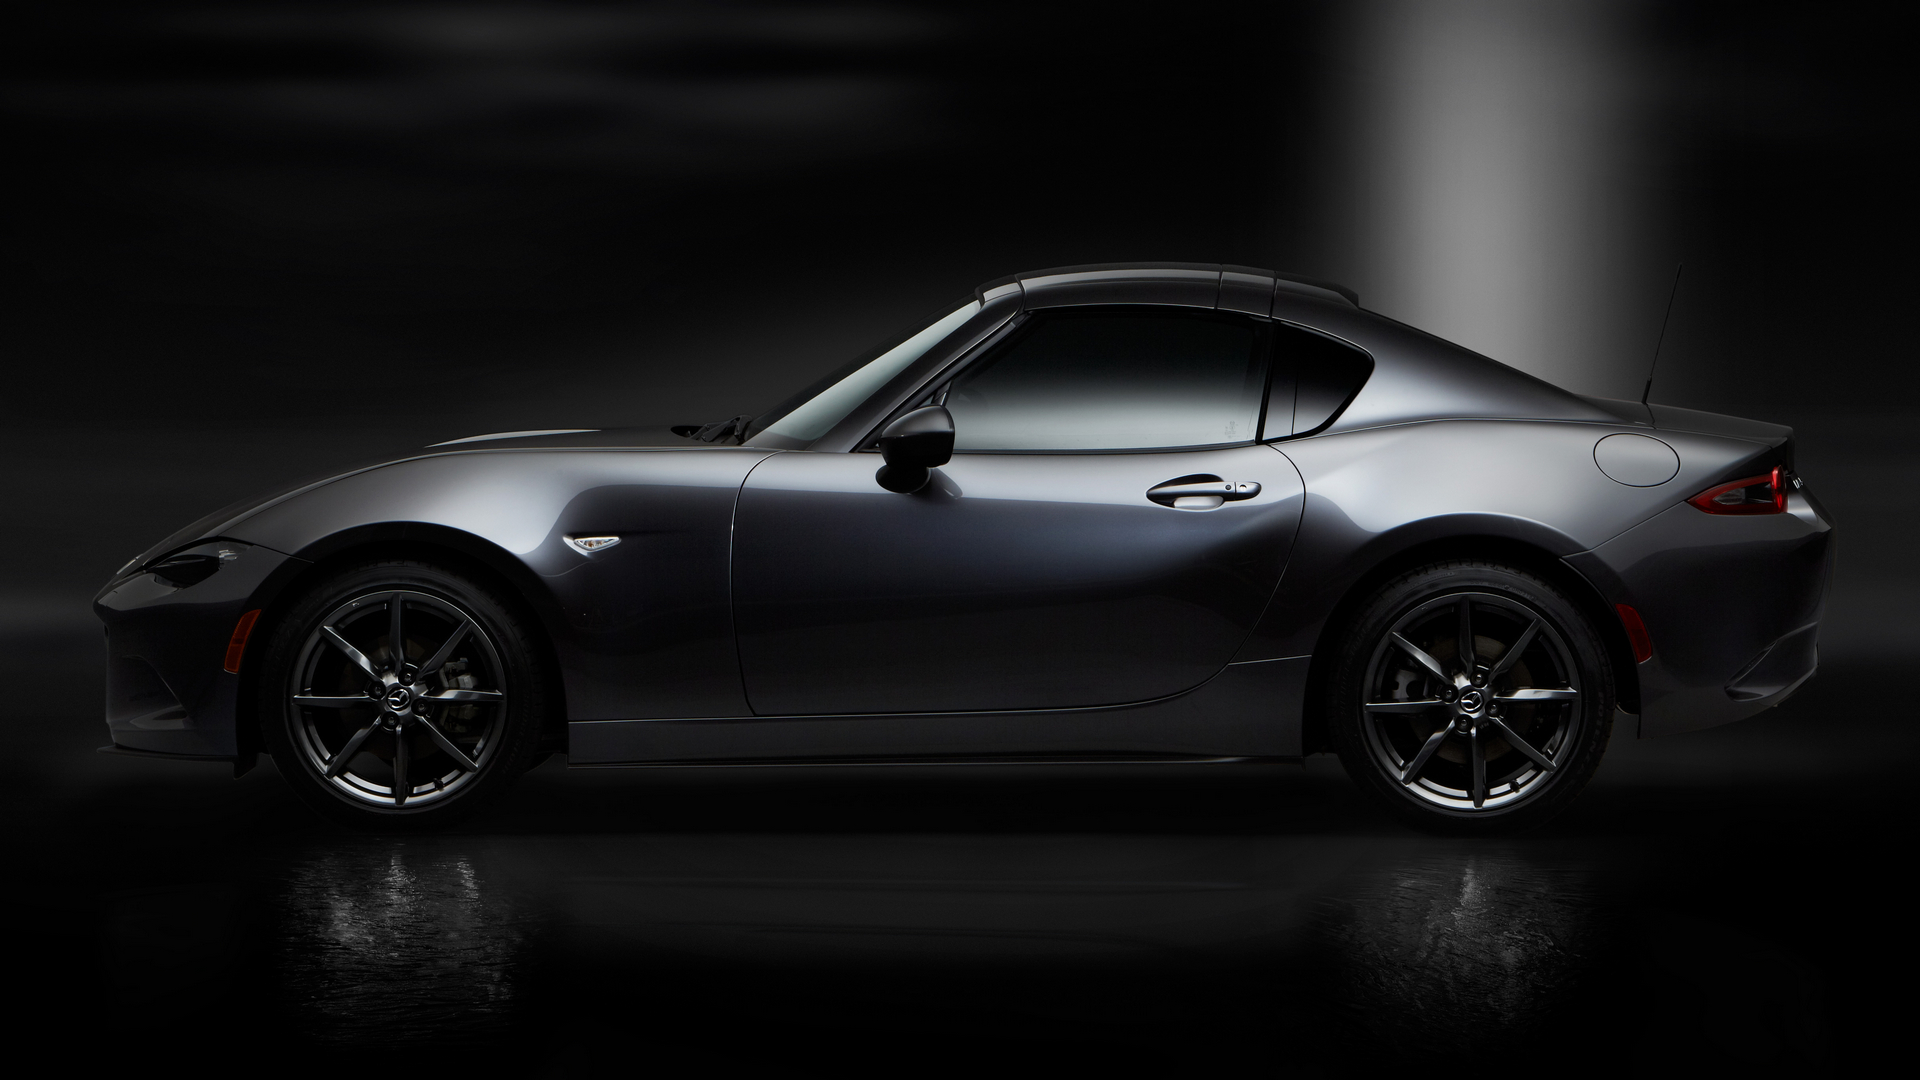 2017 Mazda MX-5 Miata RF © Mazda Motor Corporation